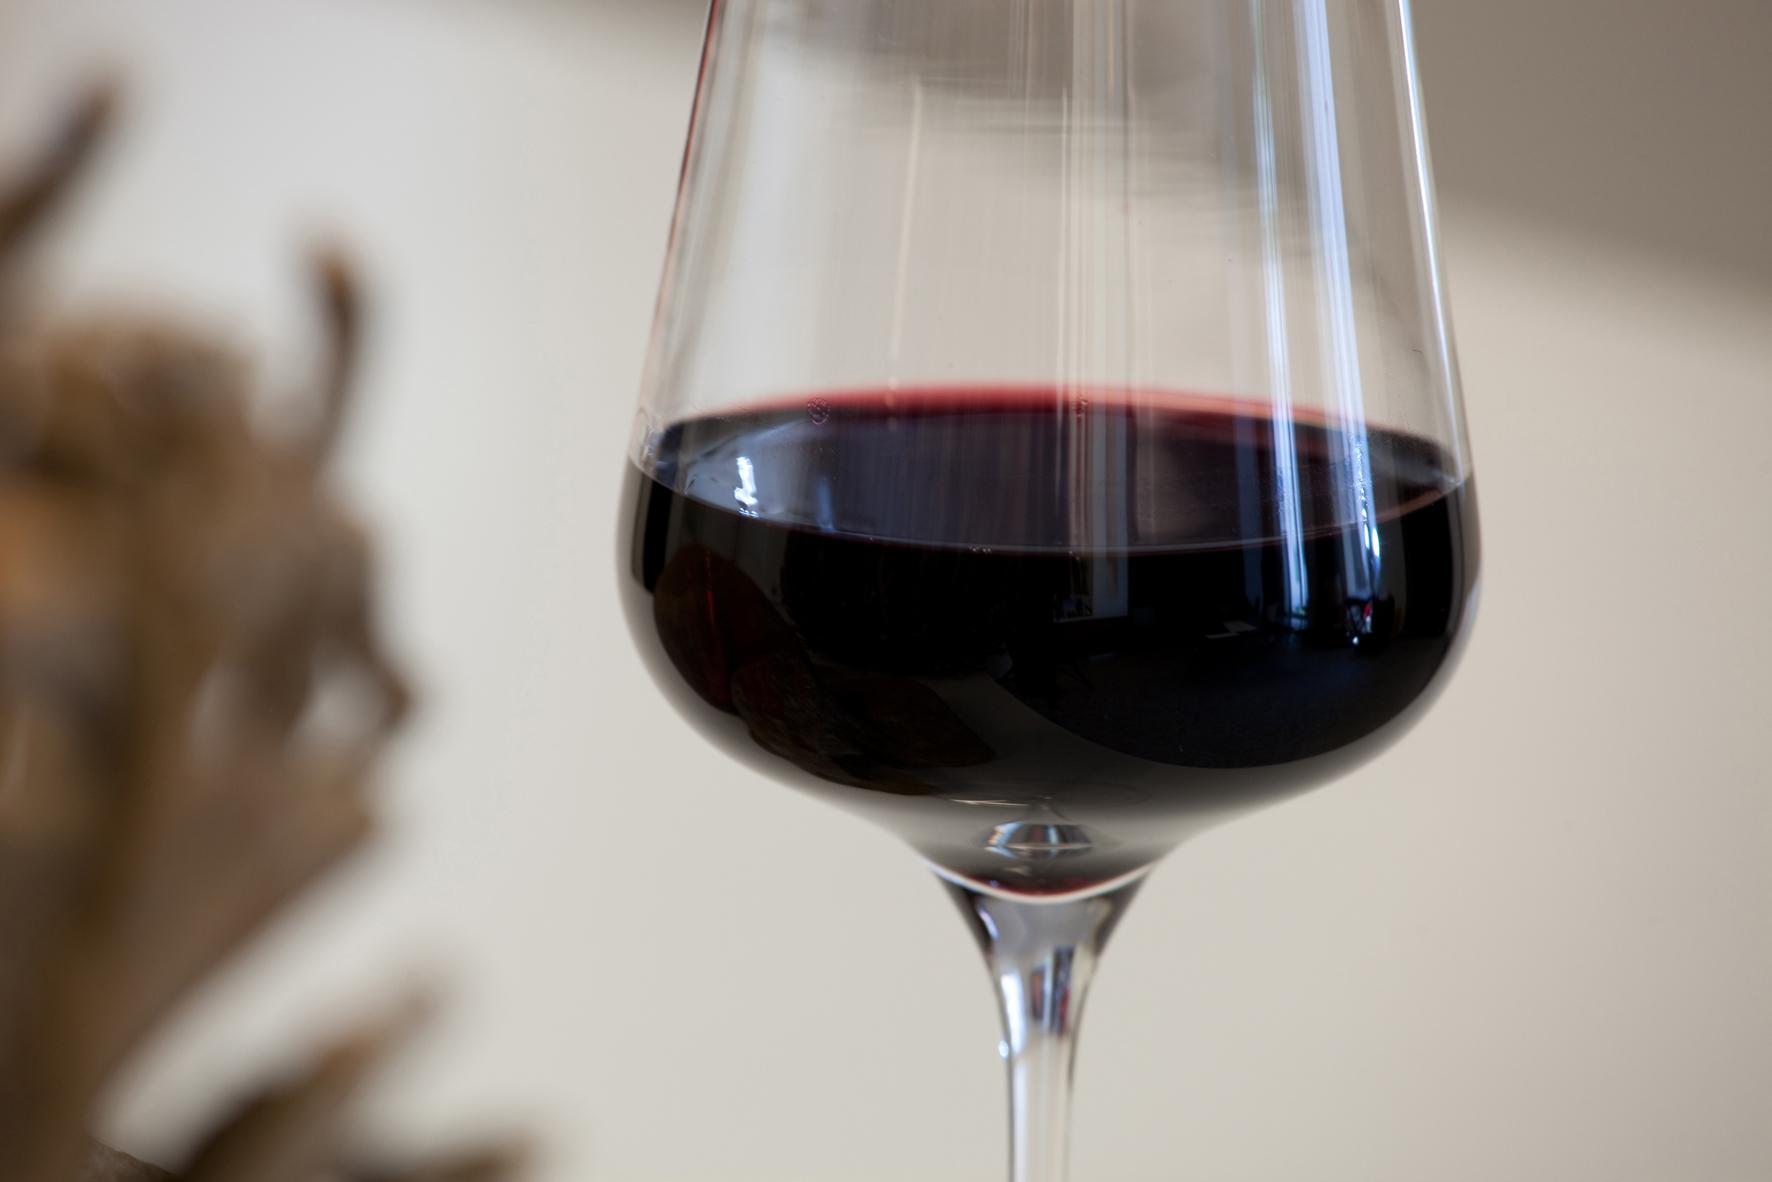 Glas mit edlem Rotwein